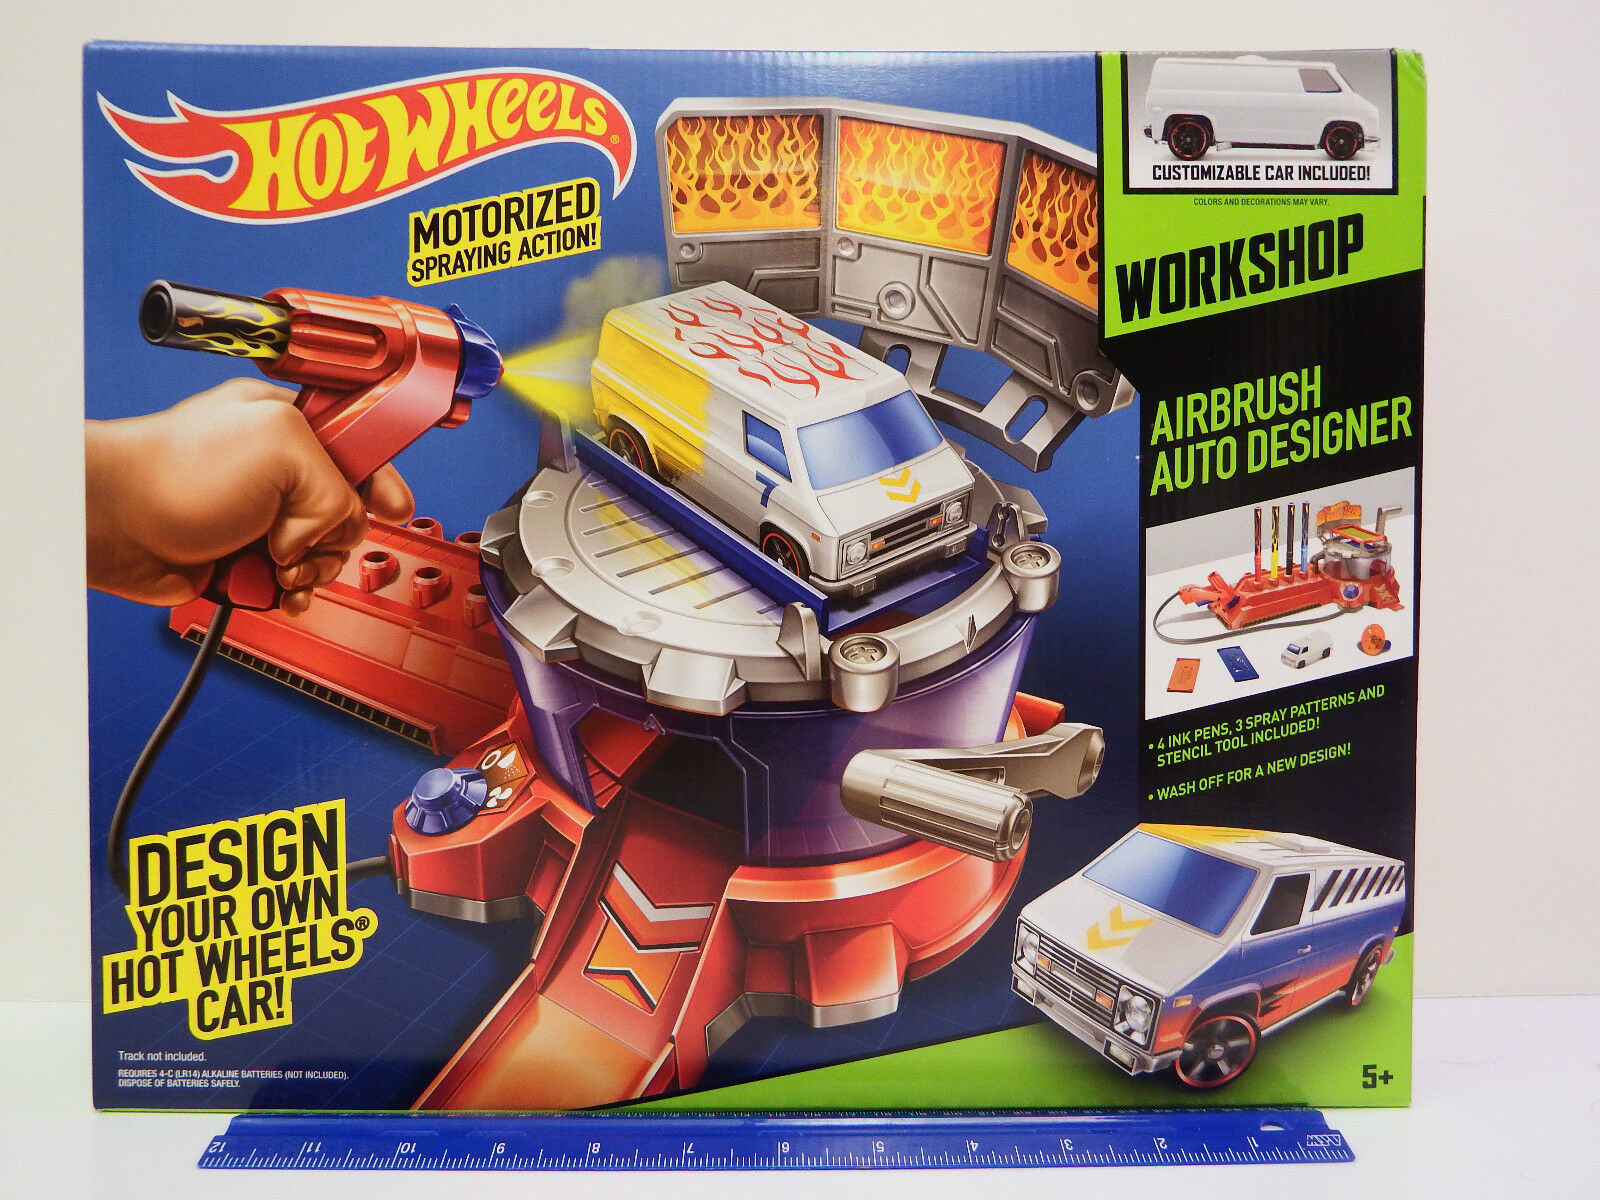 Hot Wheels Car Car Car Design Workshop - Airbrush Auto Designer -  Ages 5 & up c0ae41